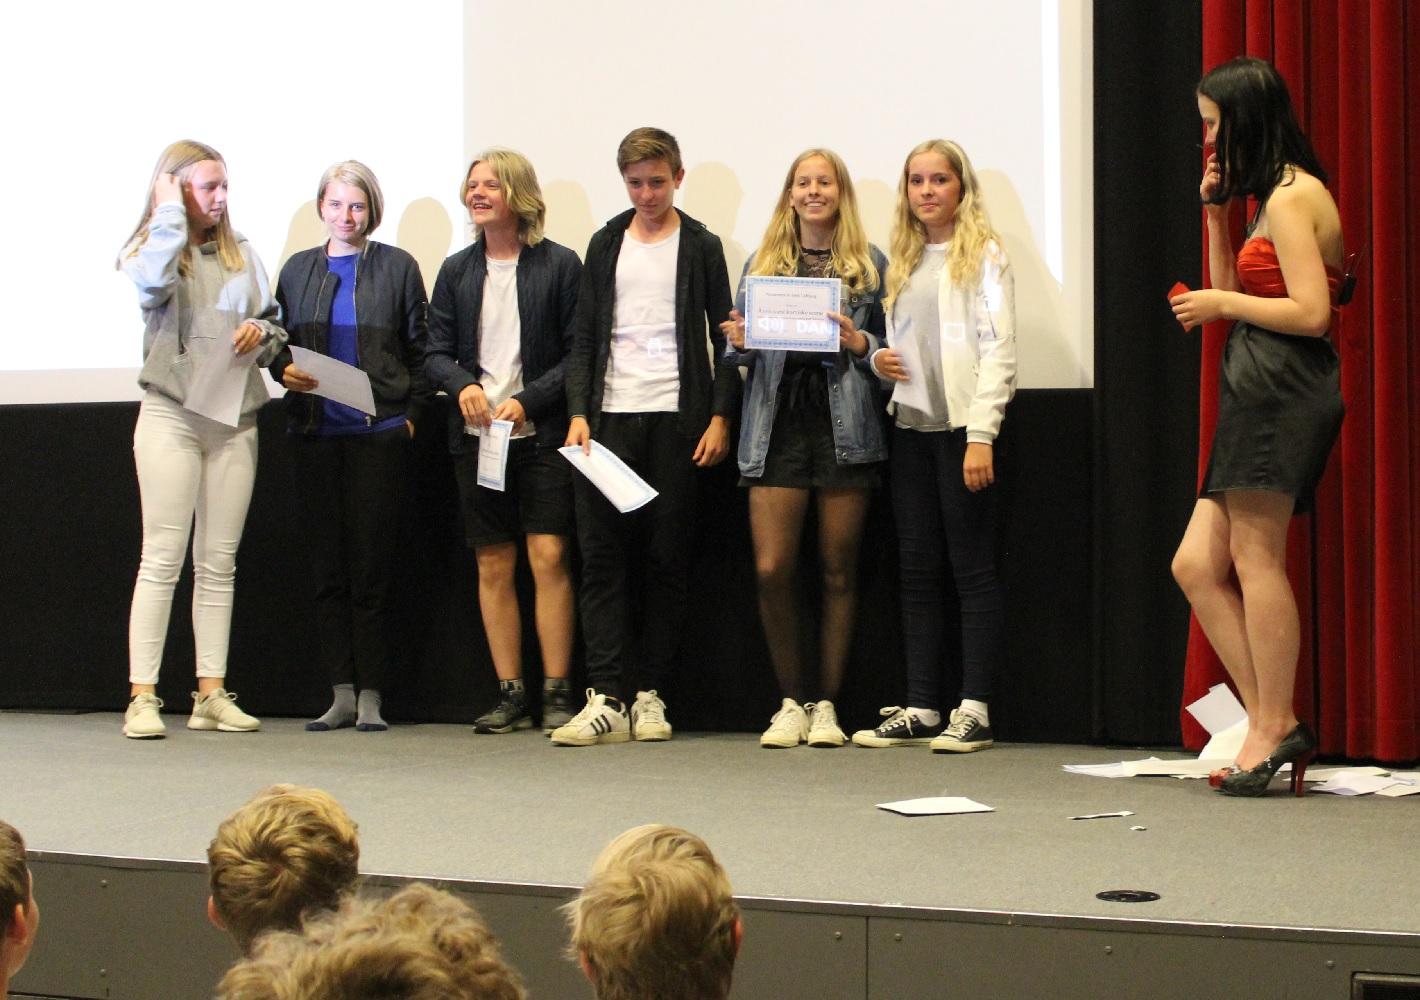 Aarupskolen holder Oscarfest i Aarup Bio